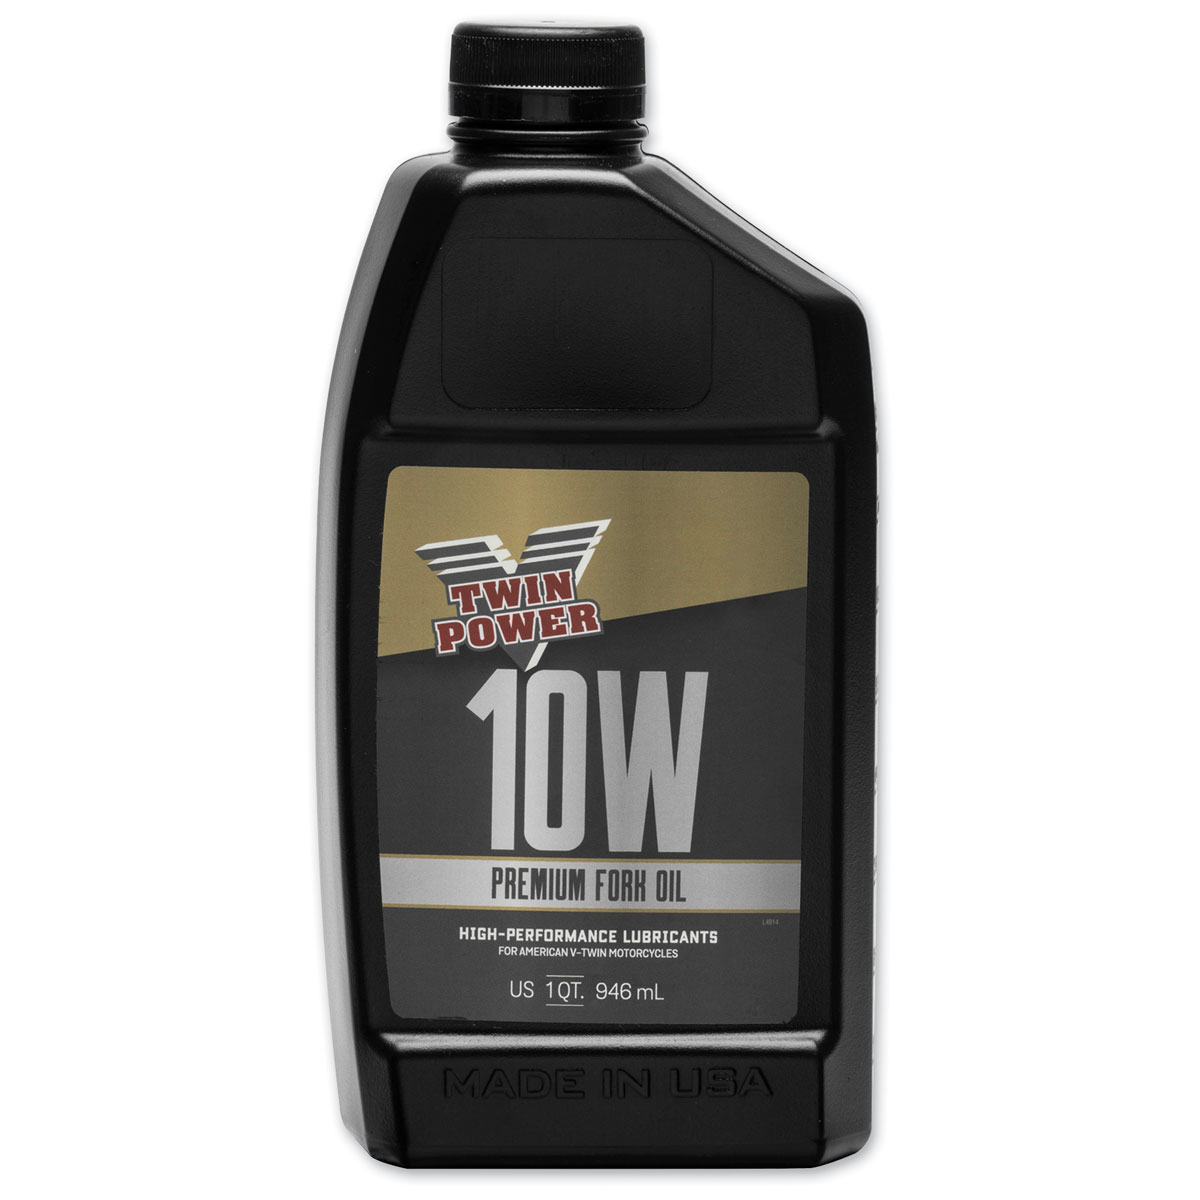 Twin Power 10W Fork Oil Quart